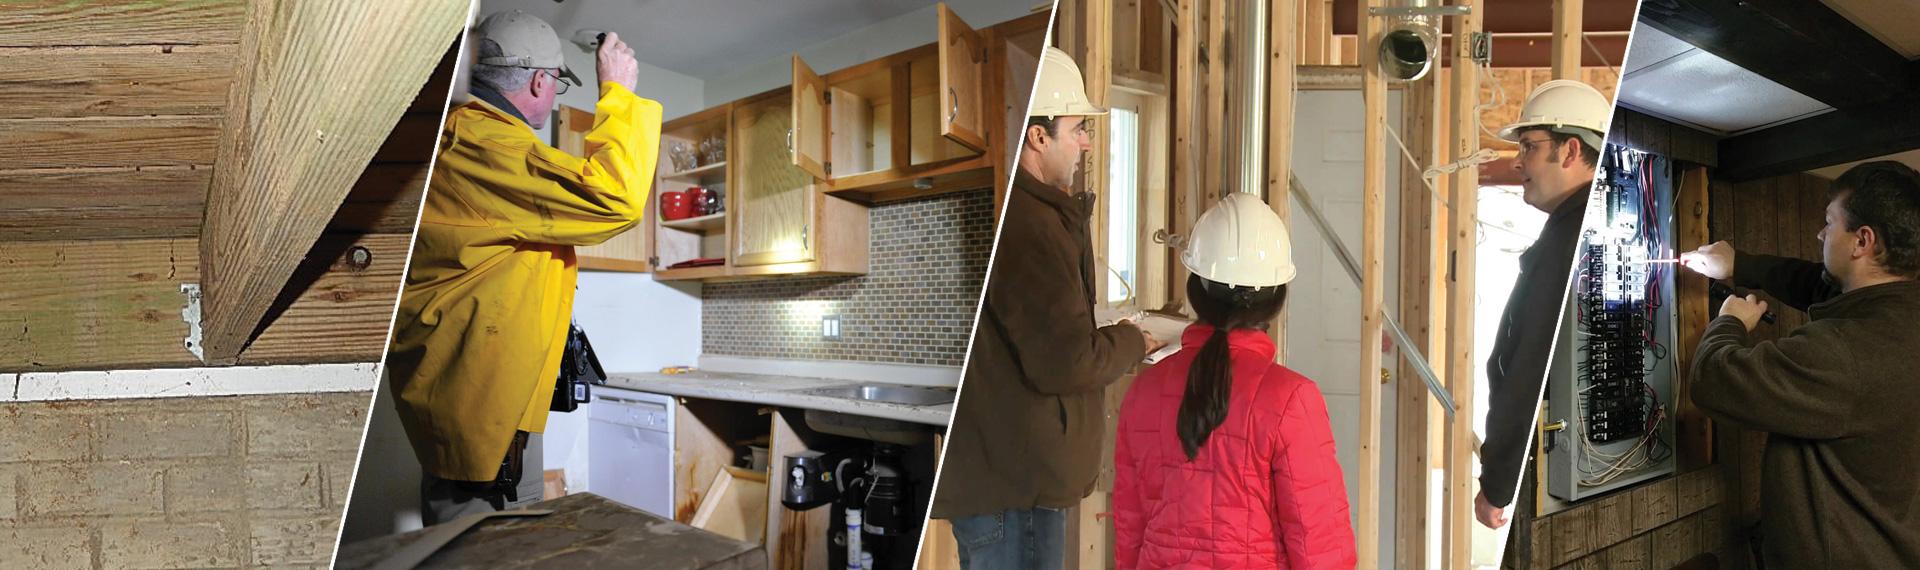 Intel Home Inspections Stafford County VA